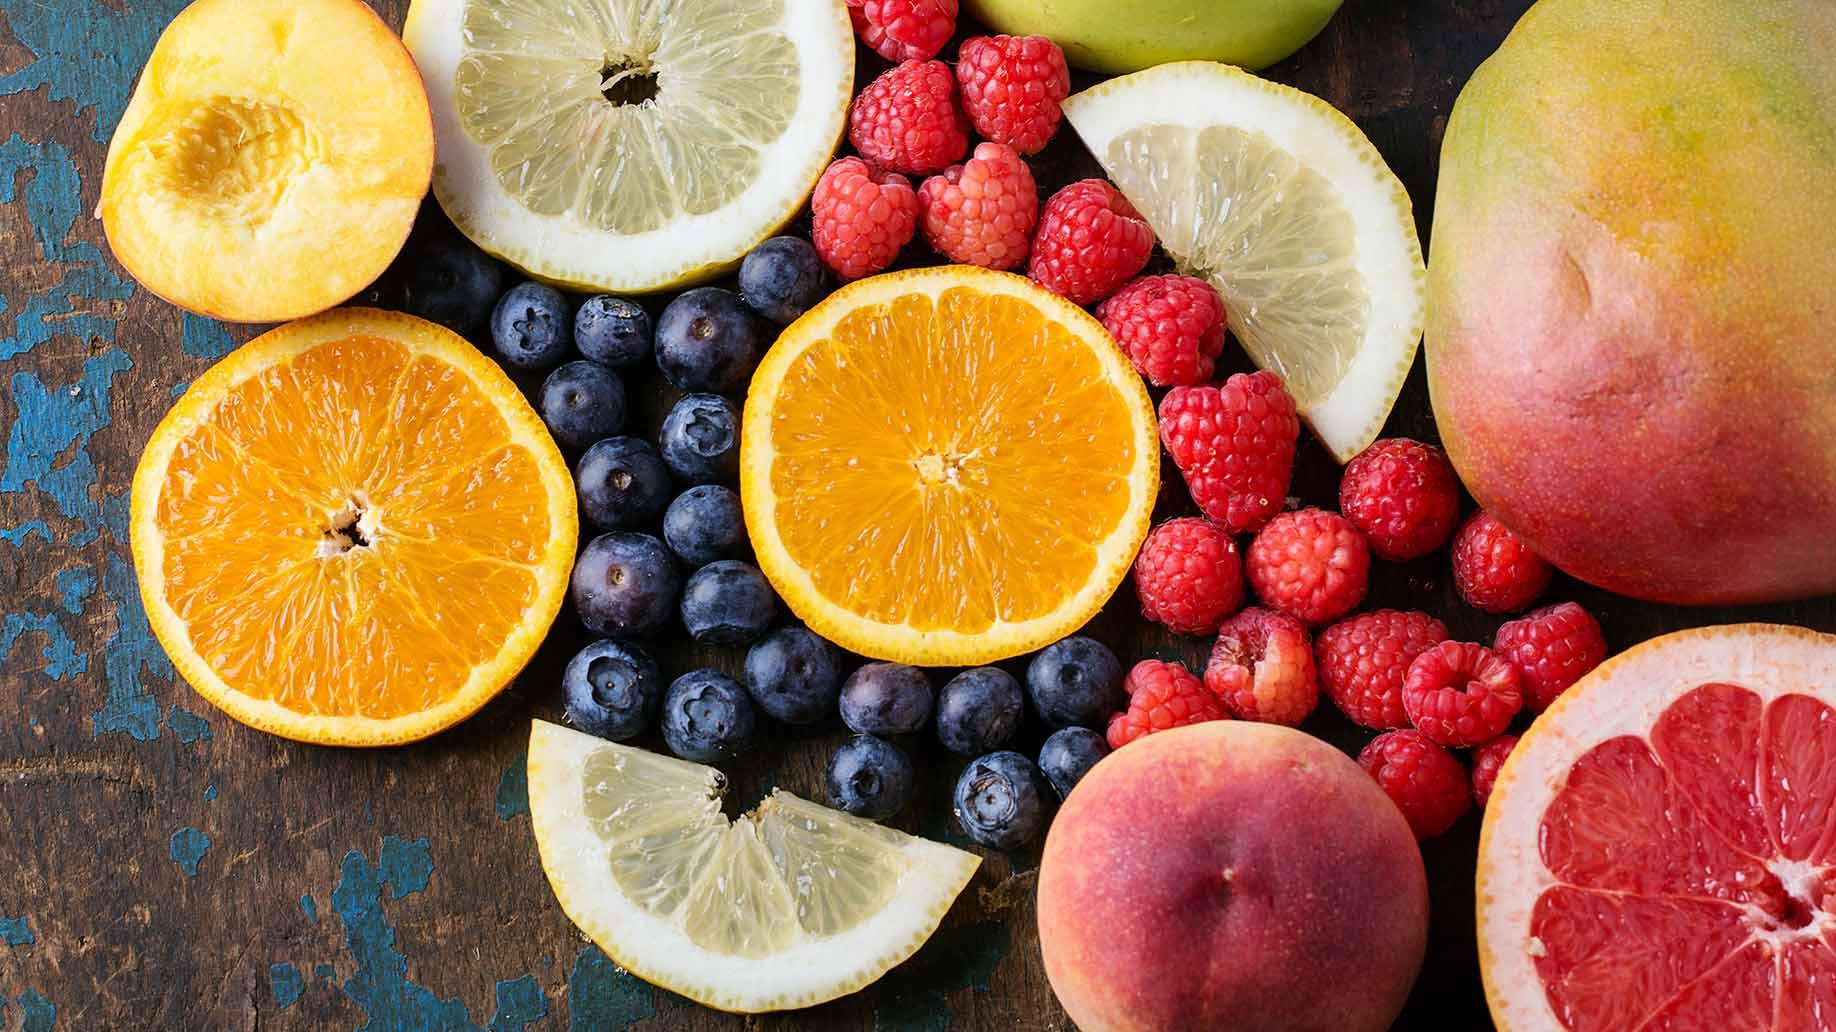 d mannose peach mango berries orange lemon grapefruit urinary tract infection uti natural remedies